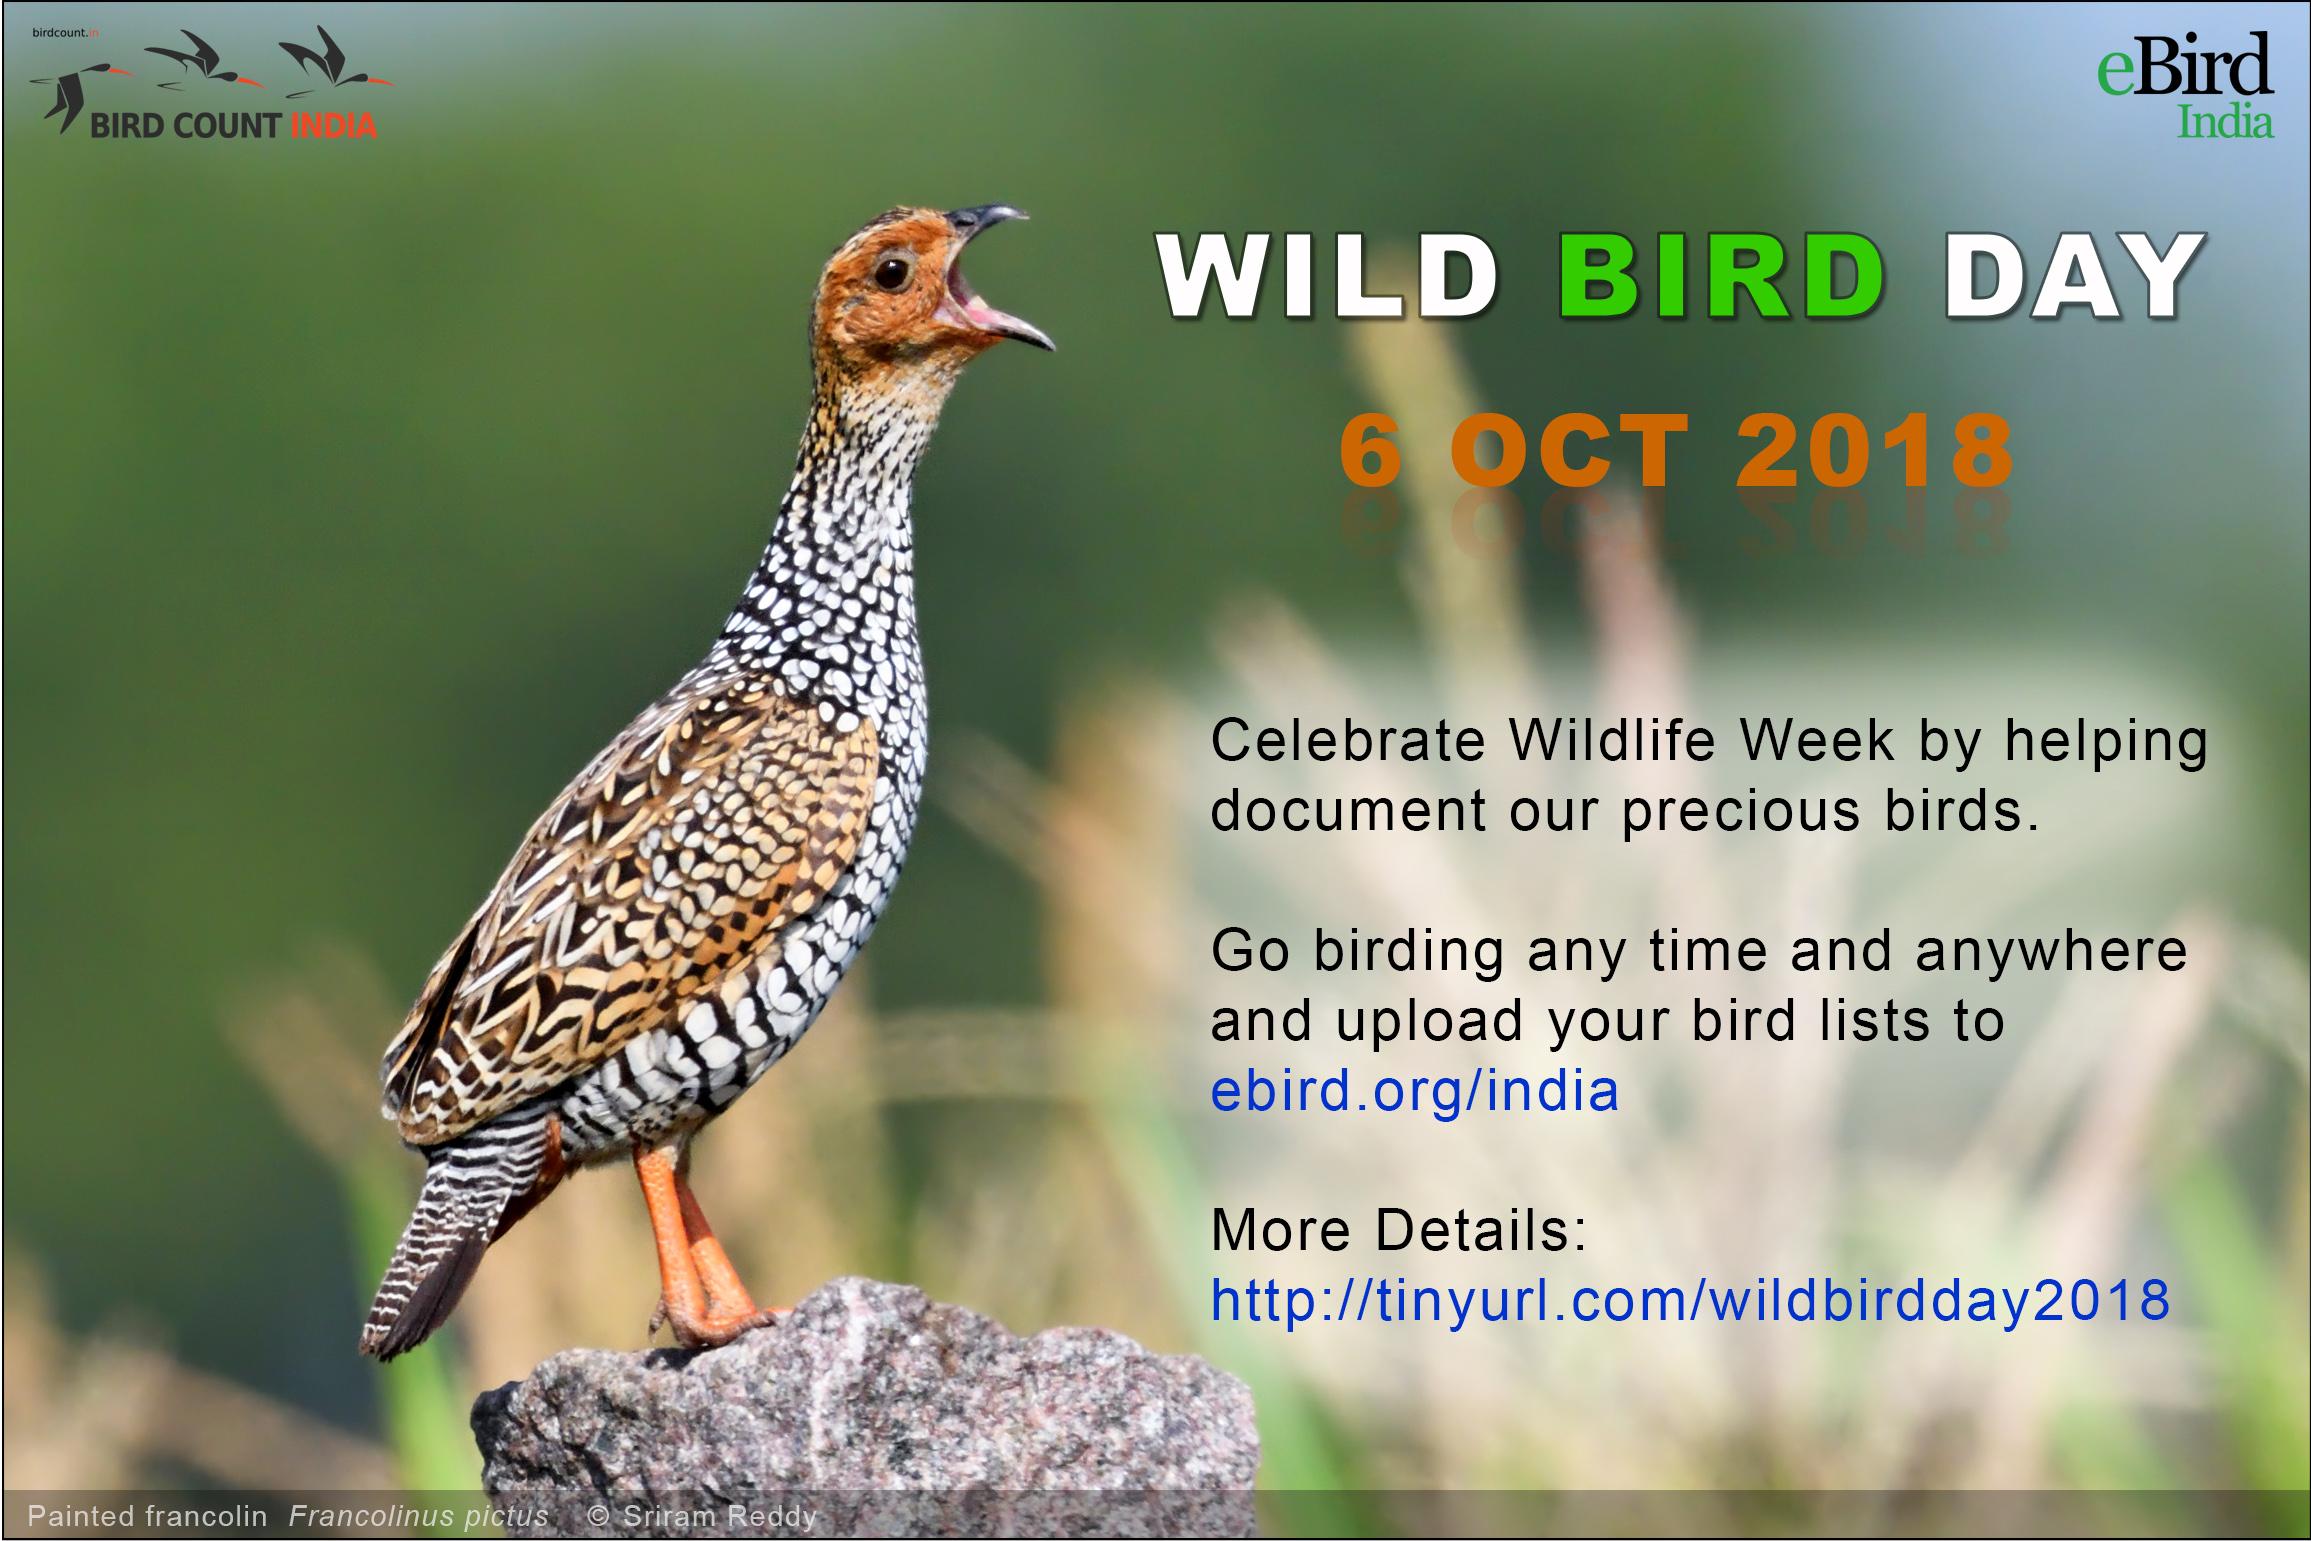 Wild Bird Day 2018 – Bird Count India